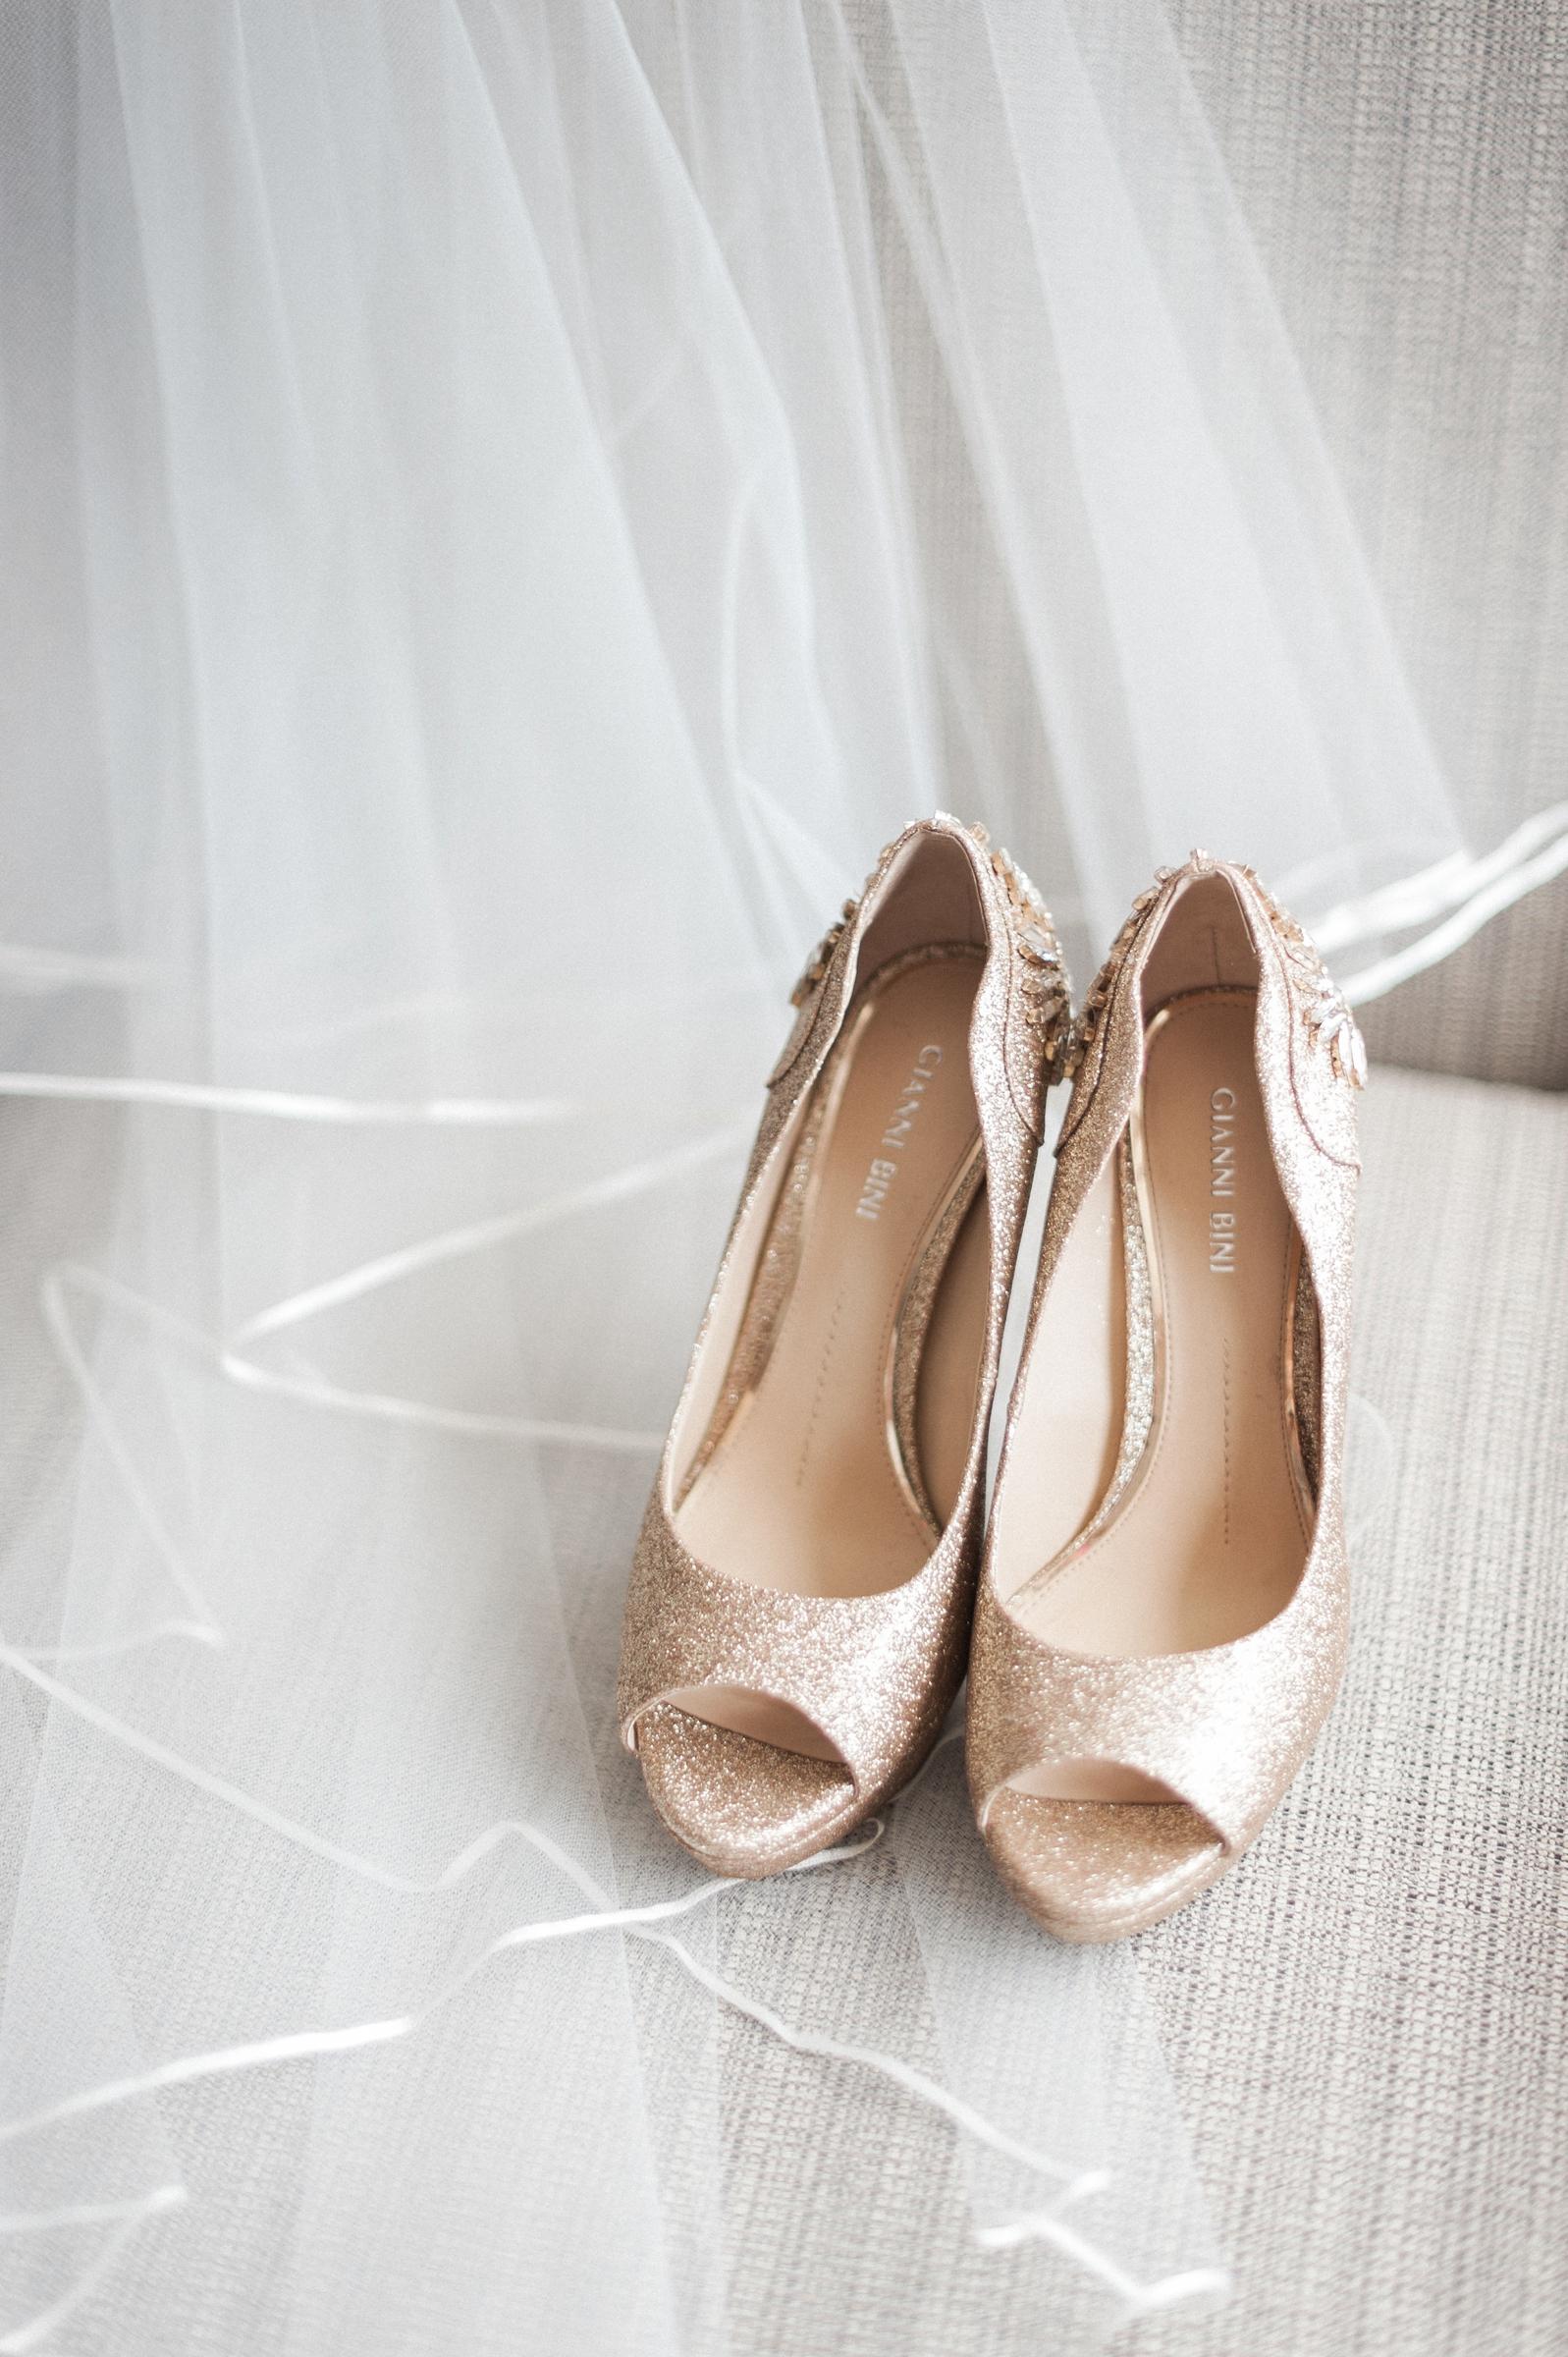 Knoxville-Wedding-Photographer_0001.jpg